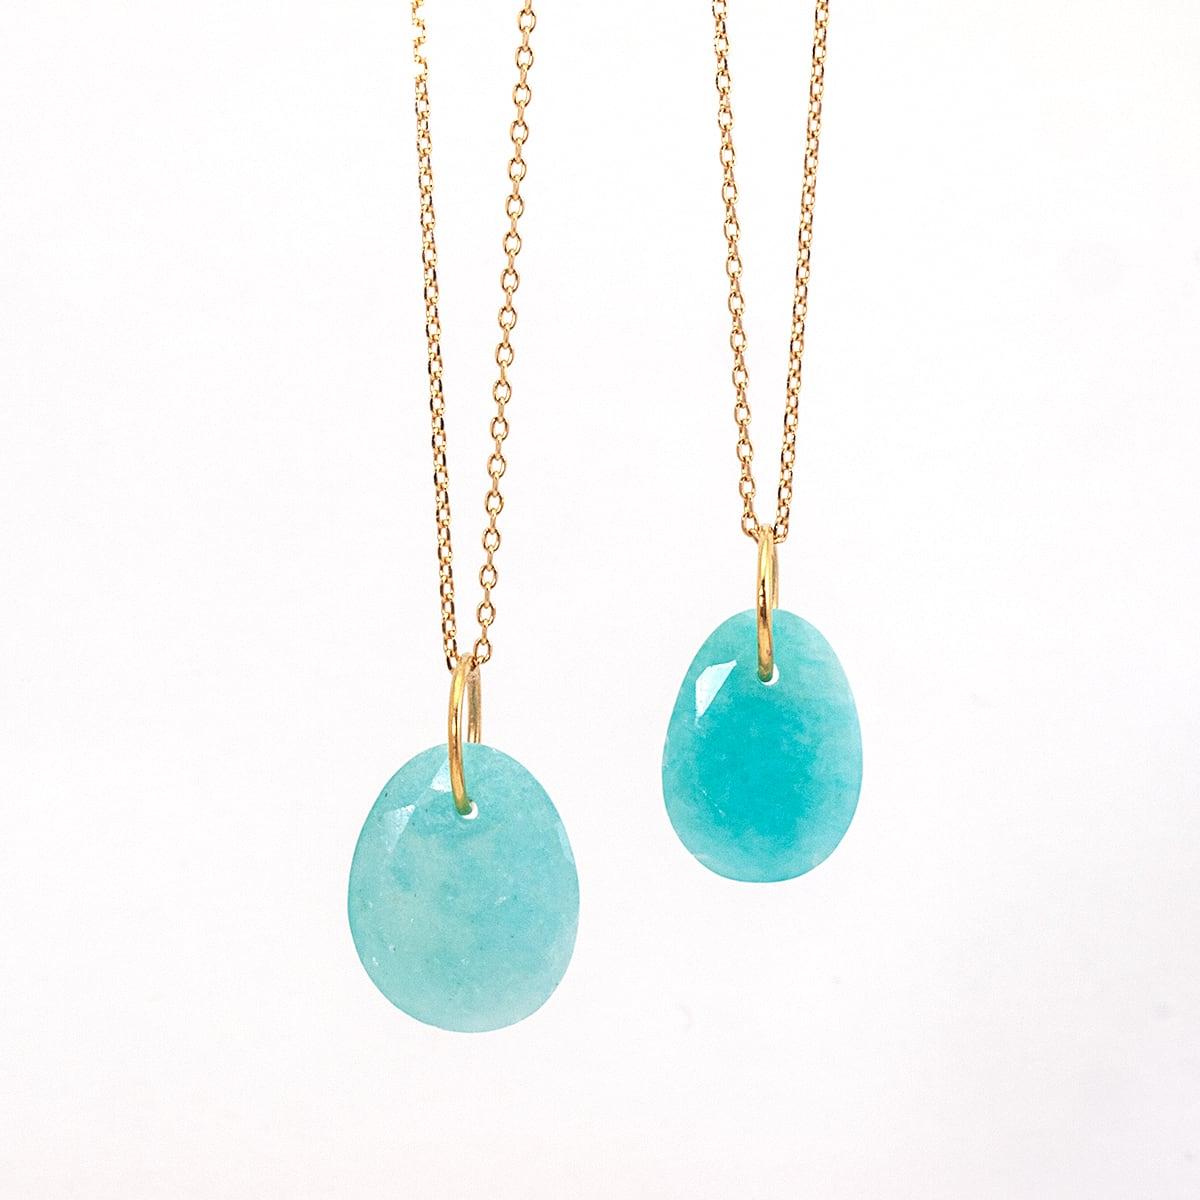 Amazonite charm necklace